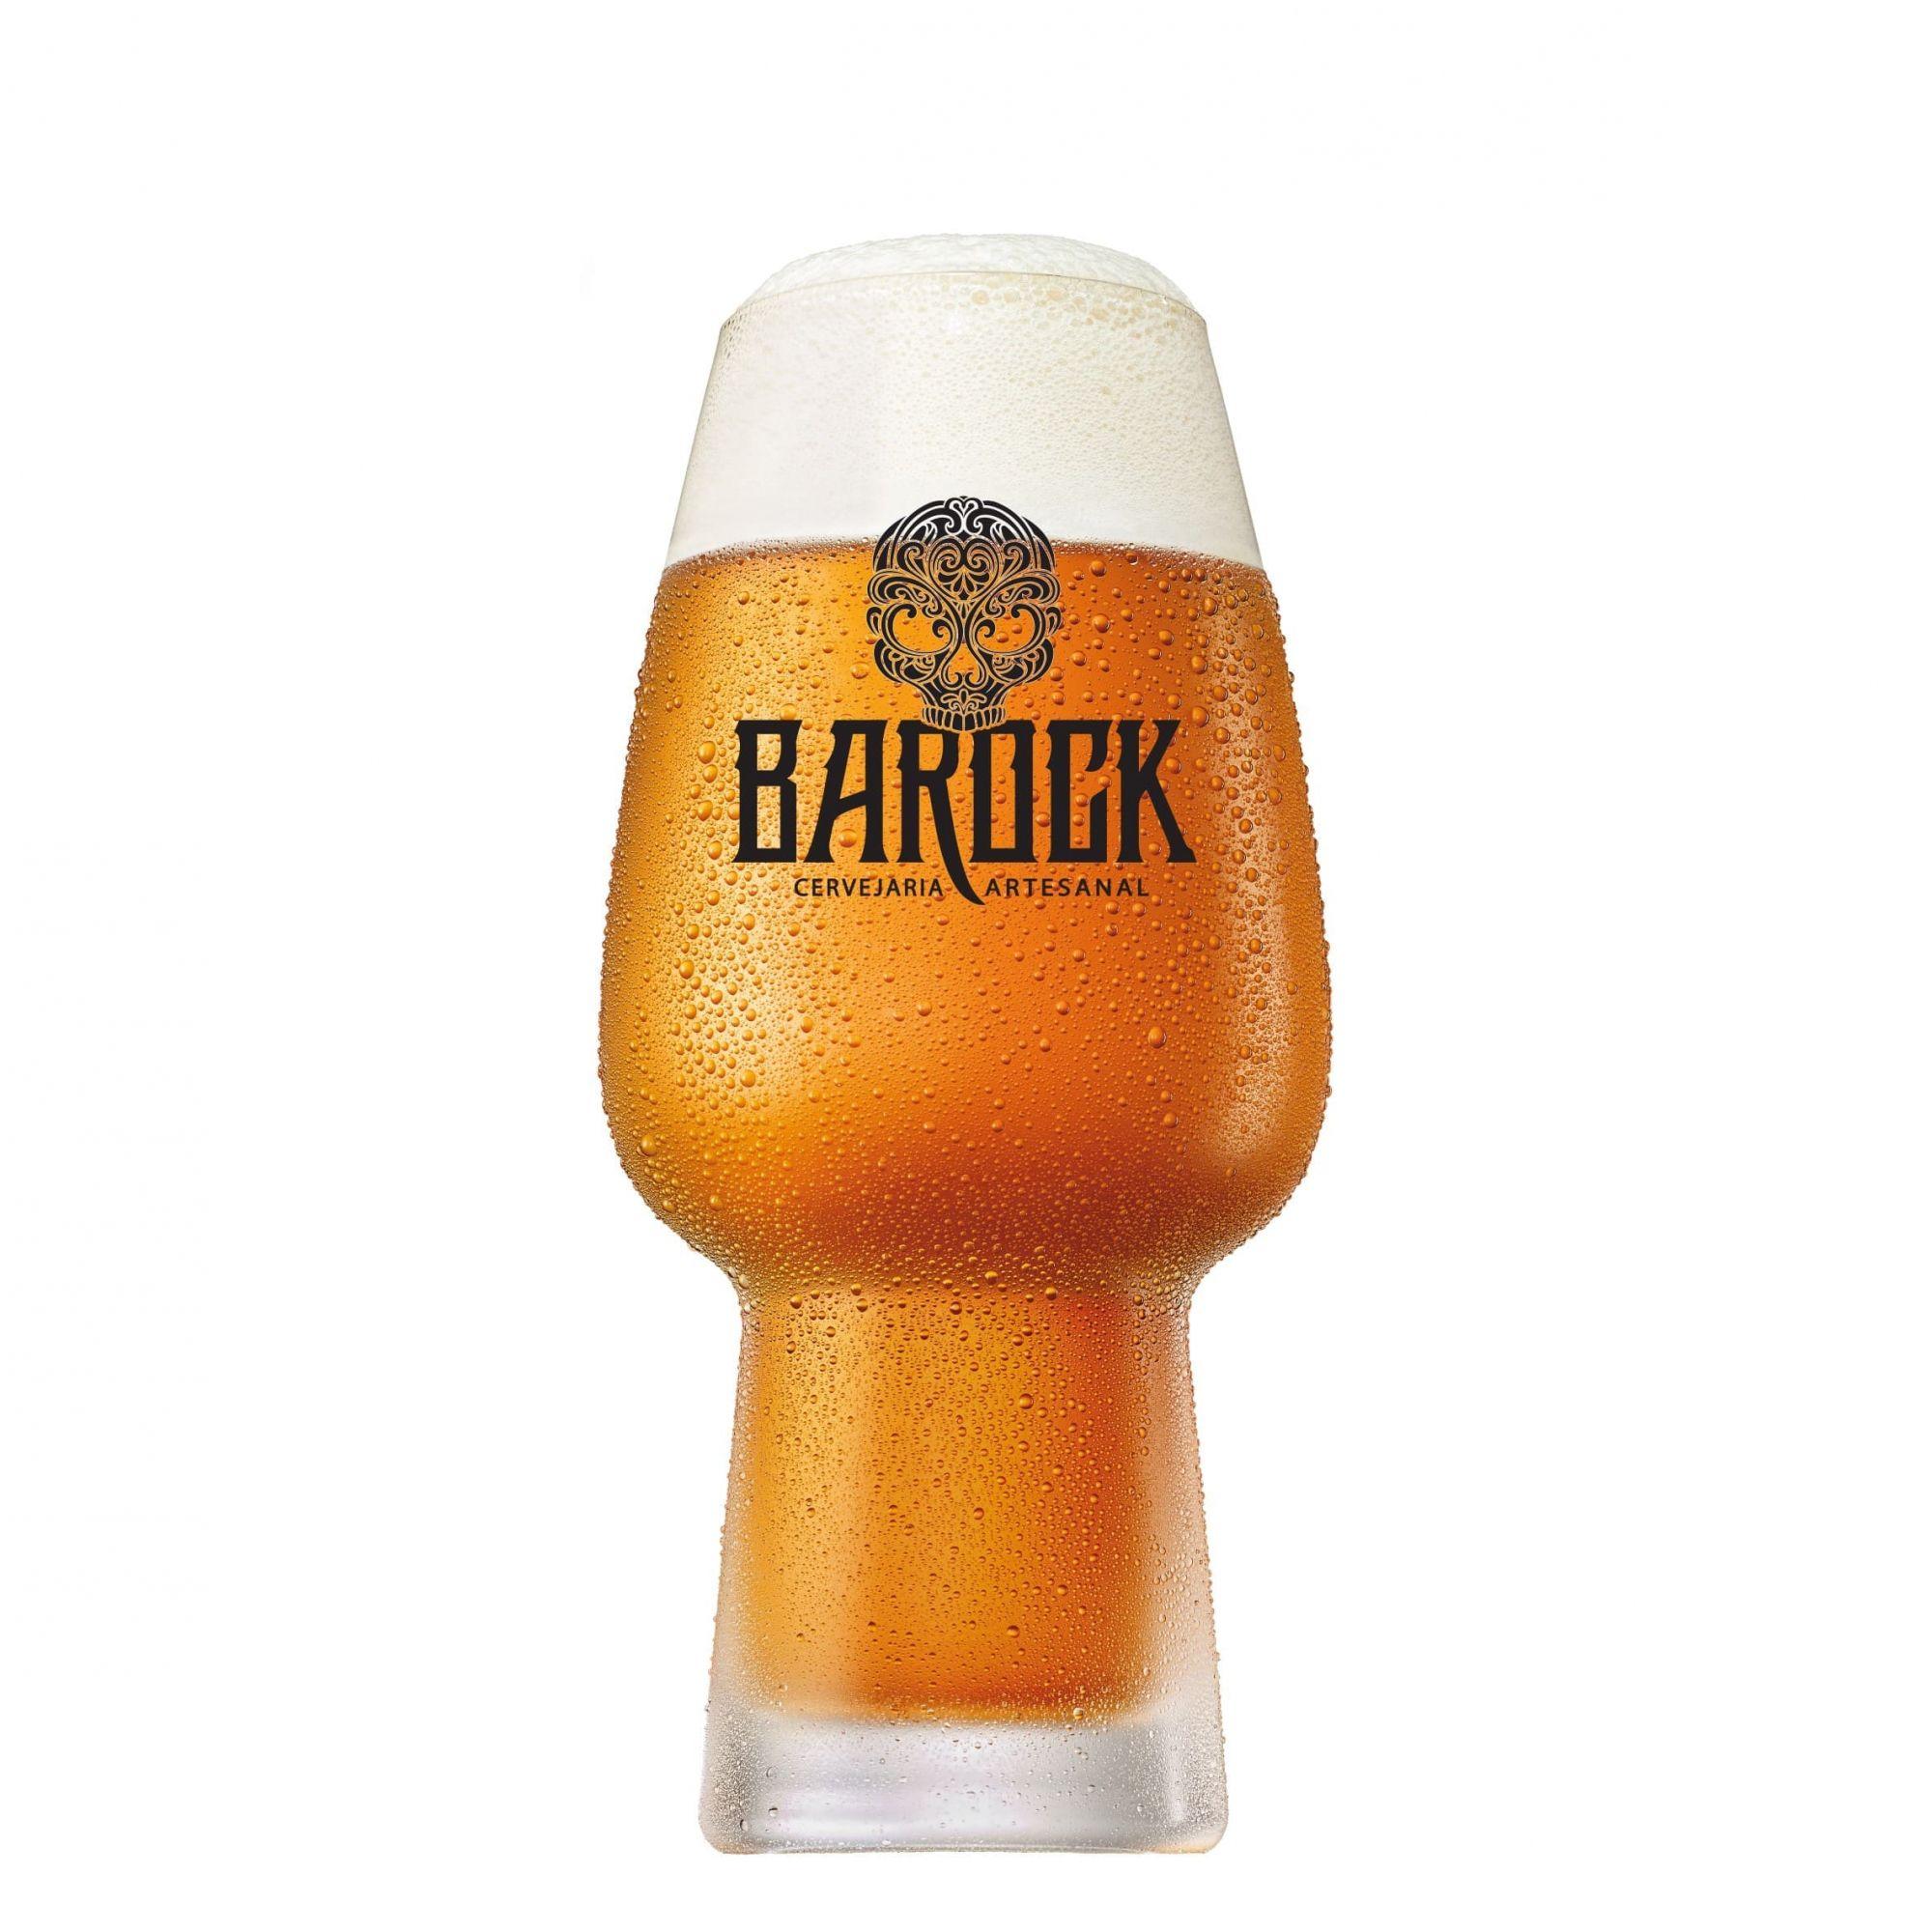 Copo de Cerveja de Cristal Craft Beer Barock 400ml